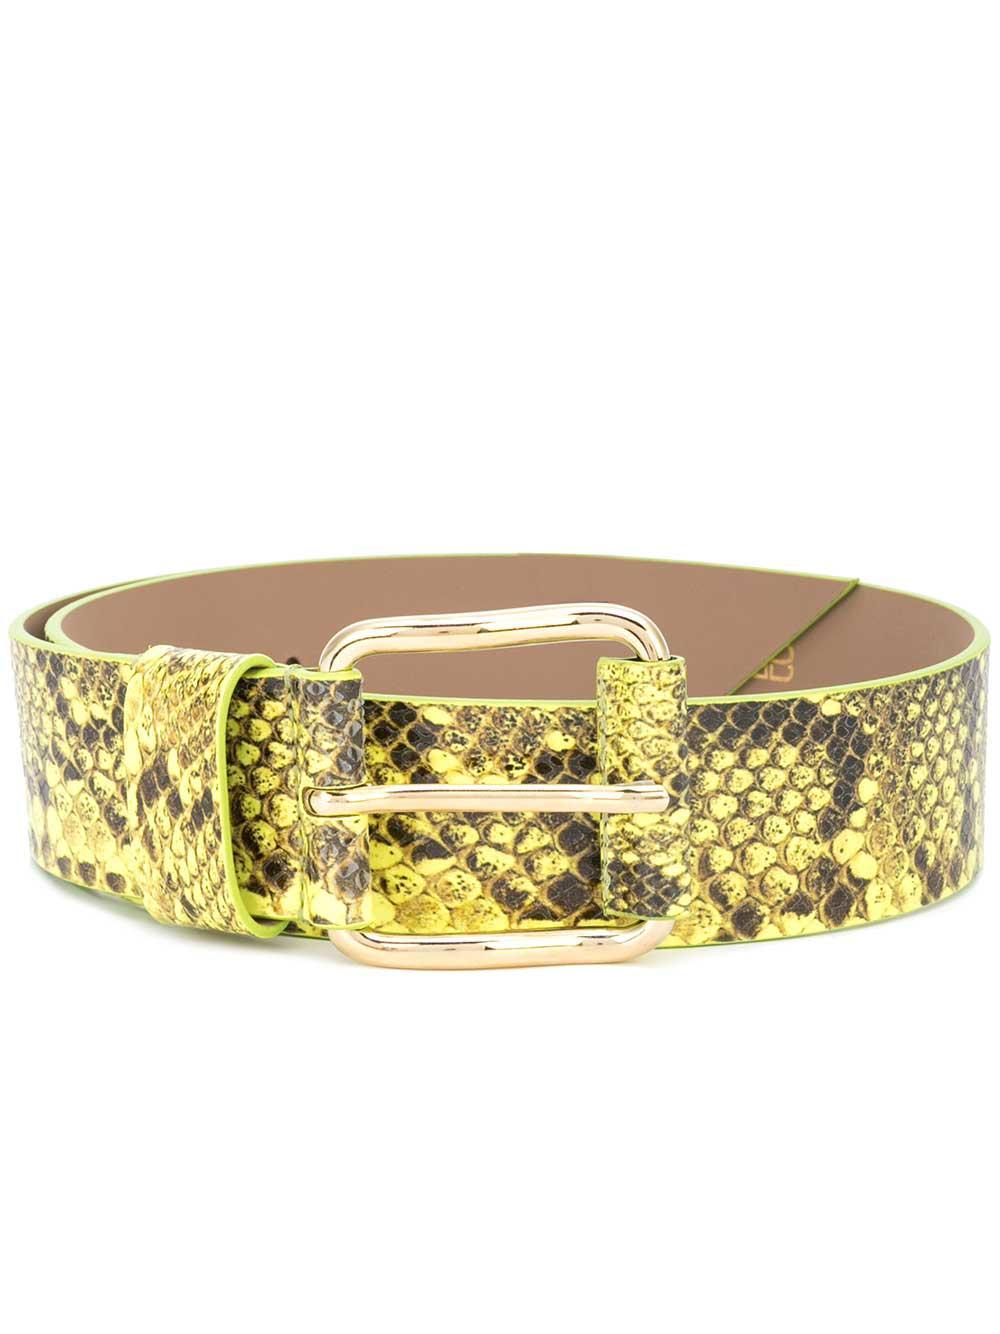 Ivy Wide Hendrix Waist Belt